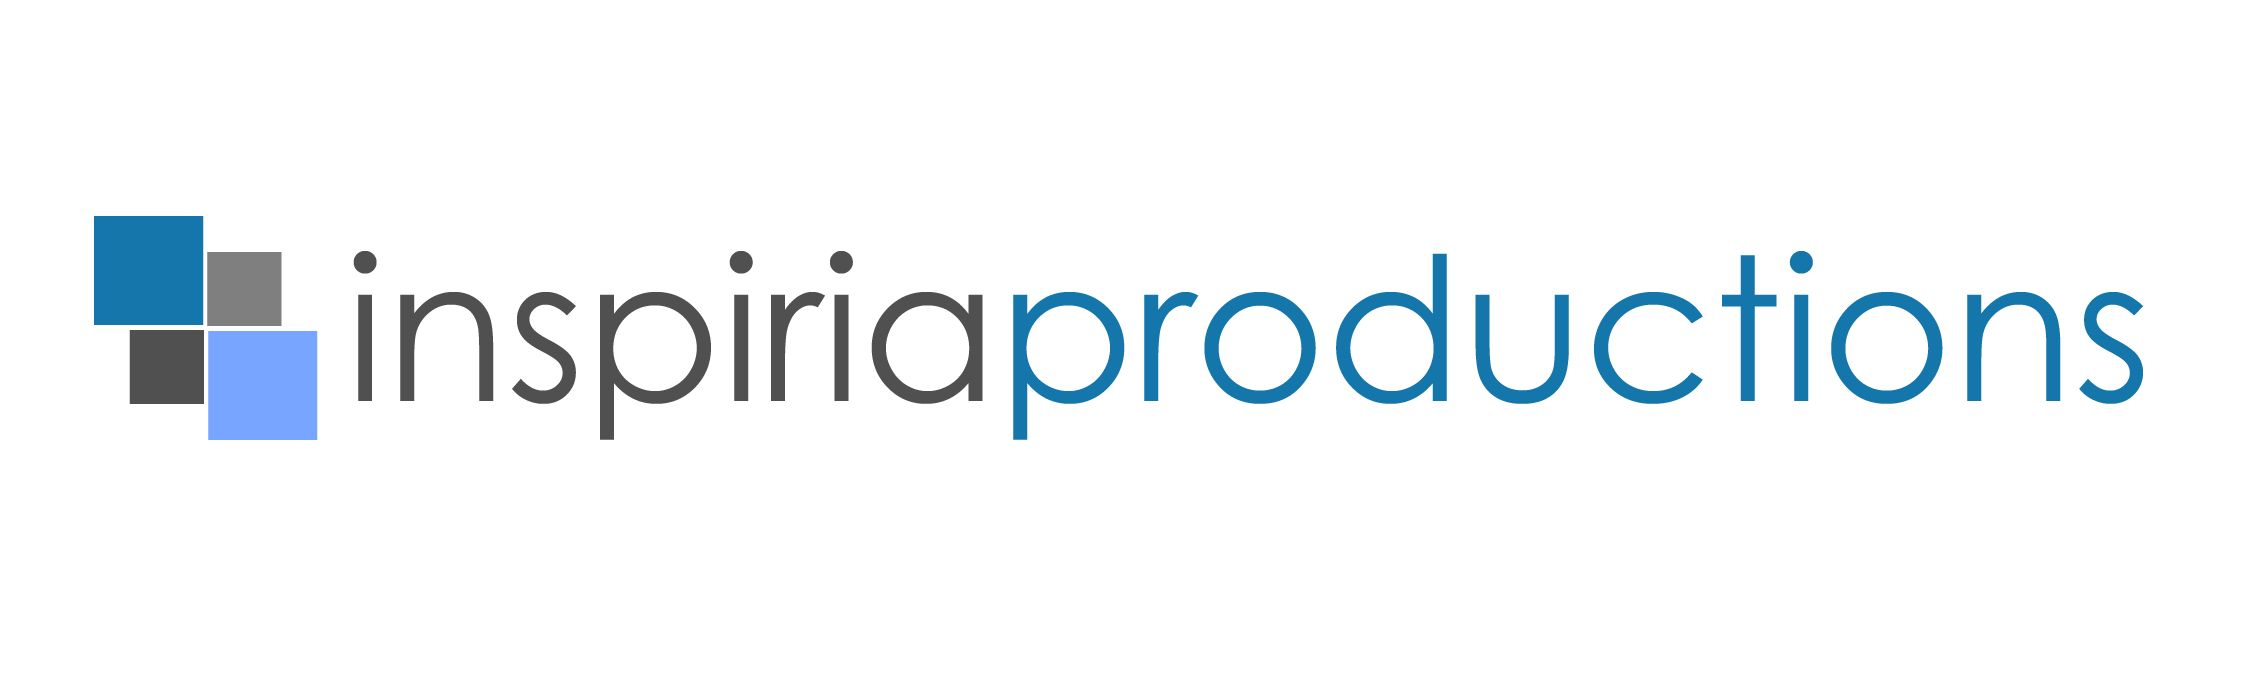 inspiria productions GmbH